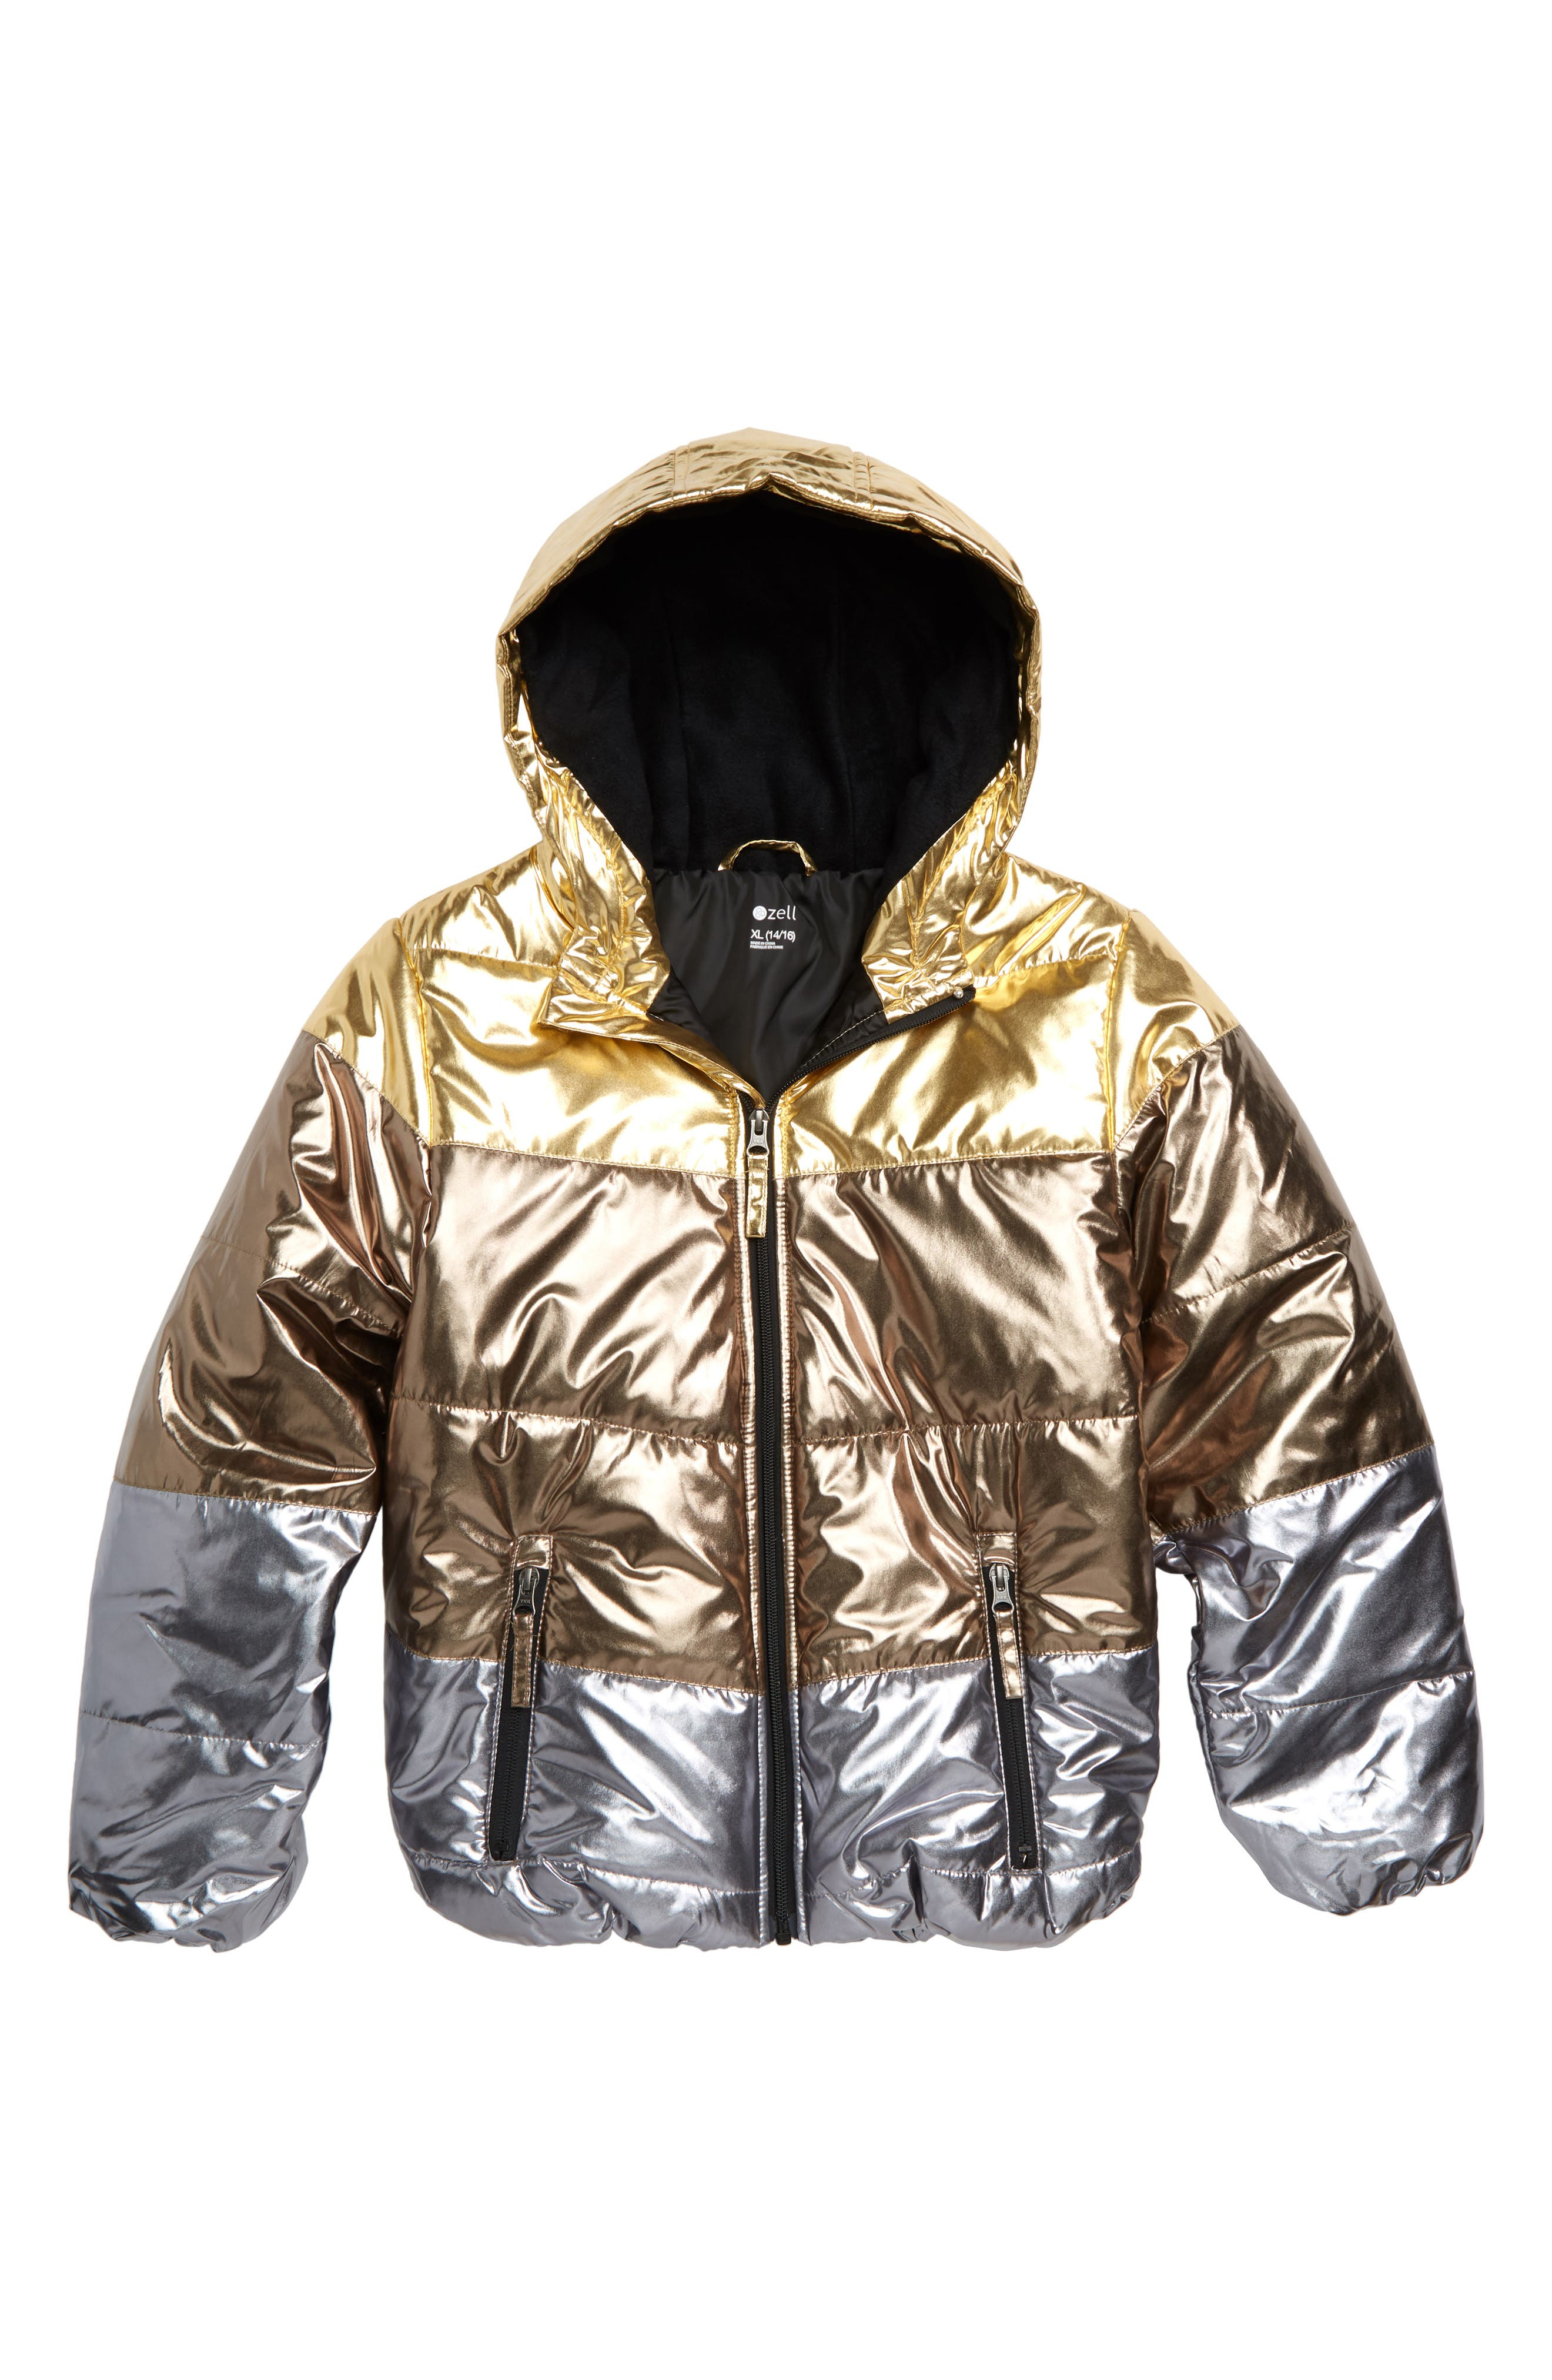 Metallic Hooded Puffer Jacket,                             Main thumbnail 1, color,                             GOLD METALLIC